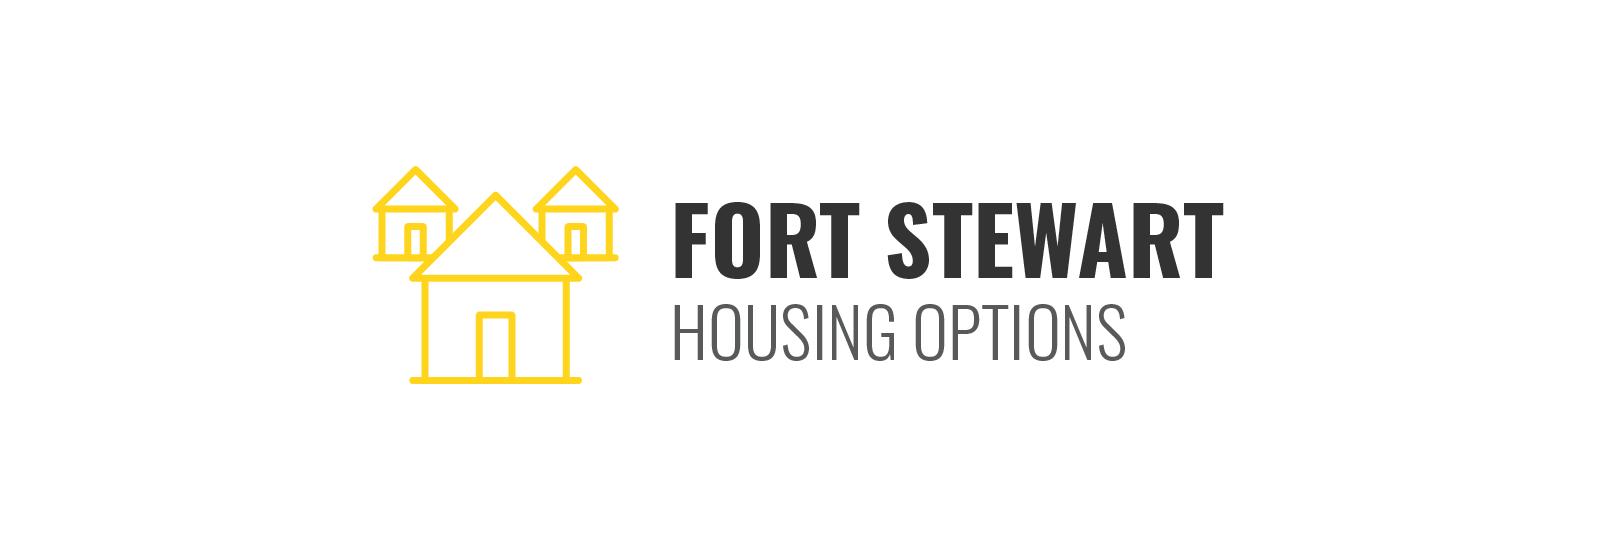 Fort Stewart Housing Options